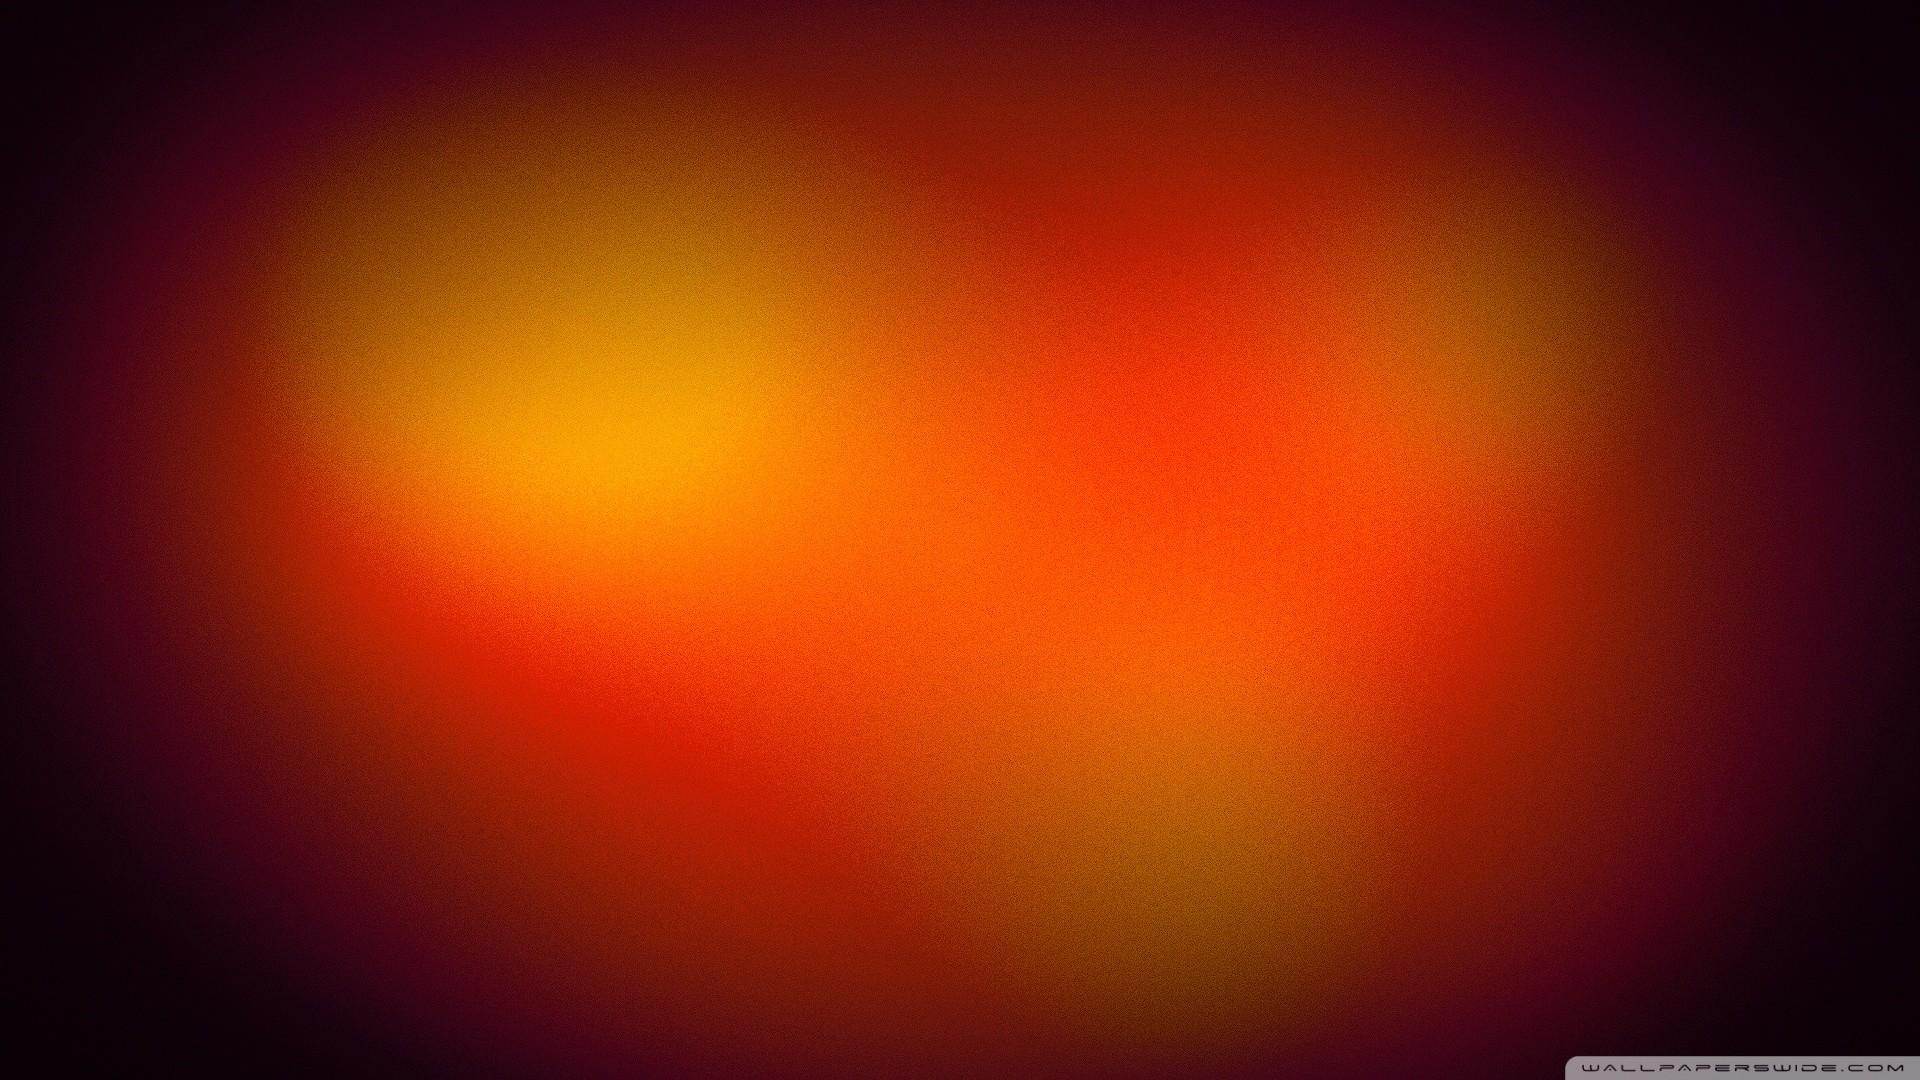 Cool Orange Backgrounds: Orange Background ·① Download Free HD Backgrounds For